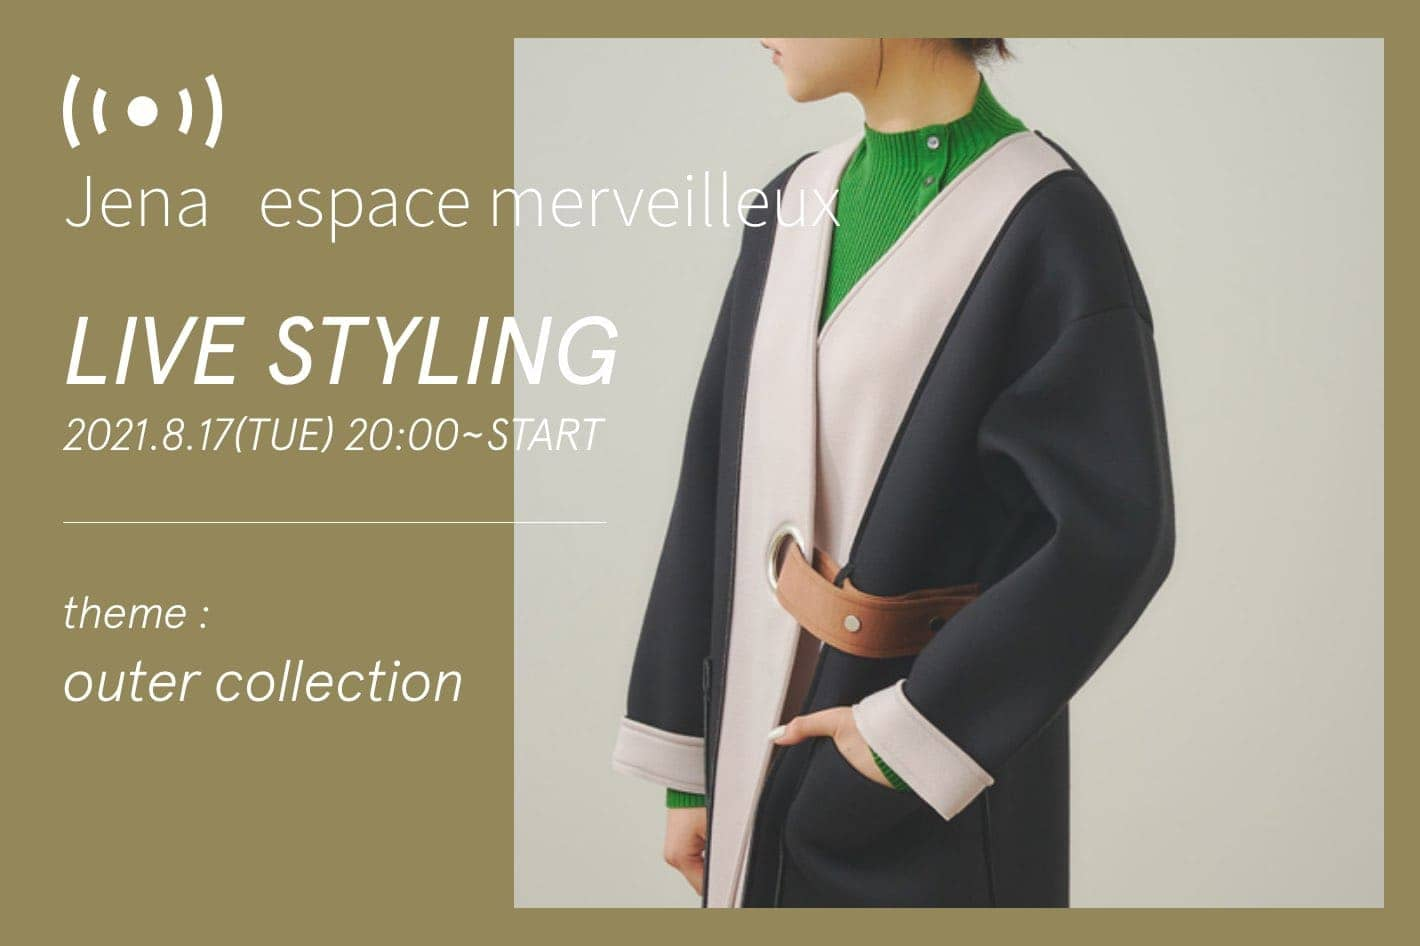 Jena espace merveilleux 【LIVE STYLING】8/17(火)20:00~配信分 アーカイブ公開中!